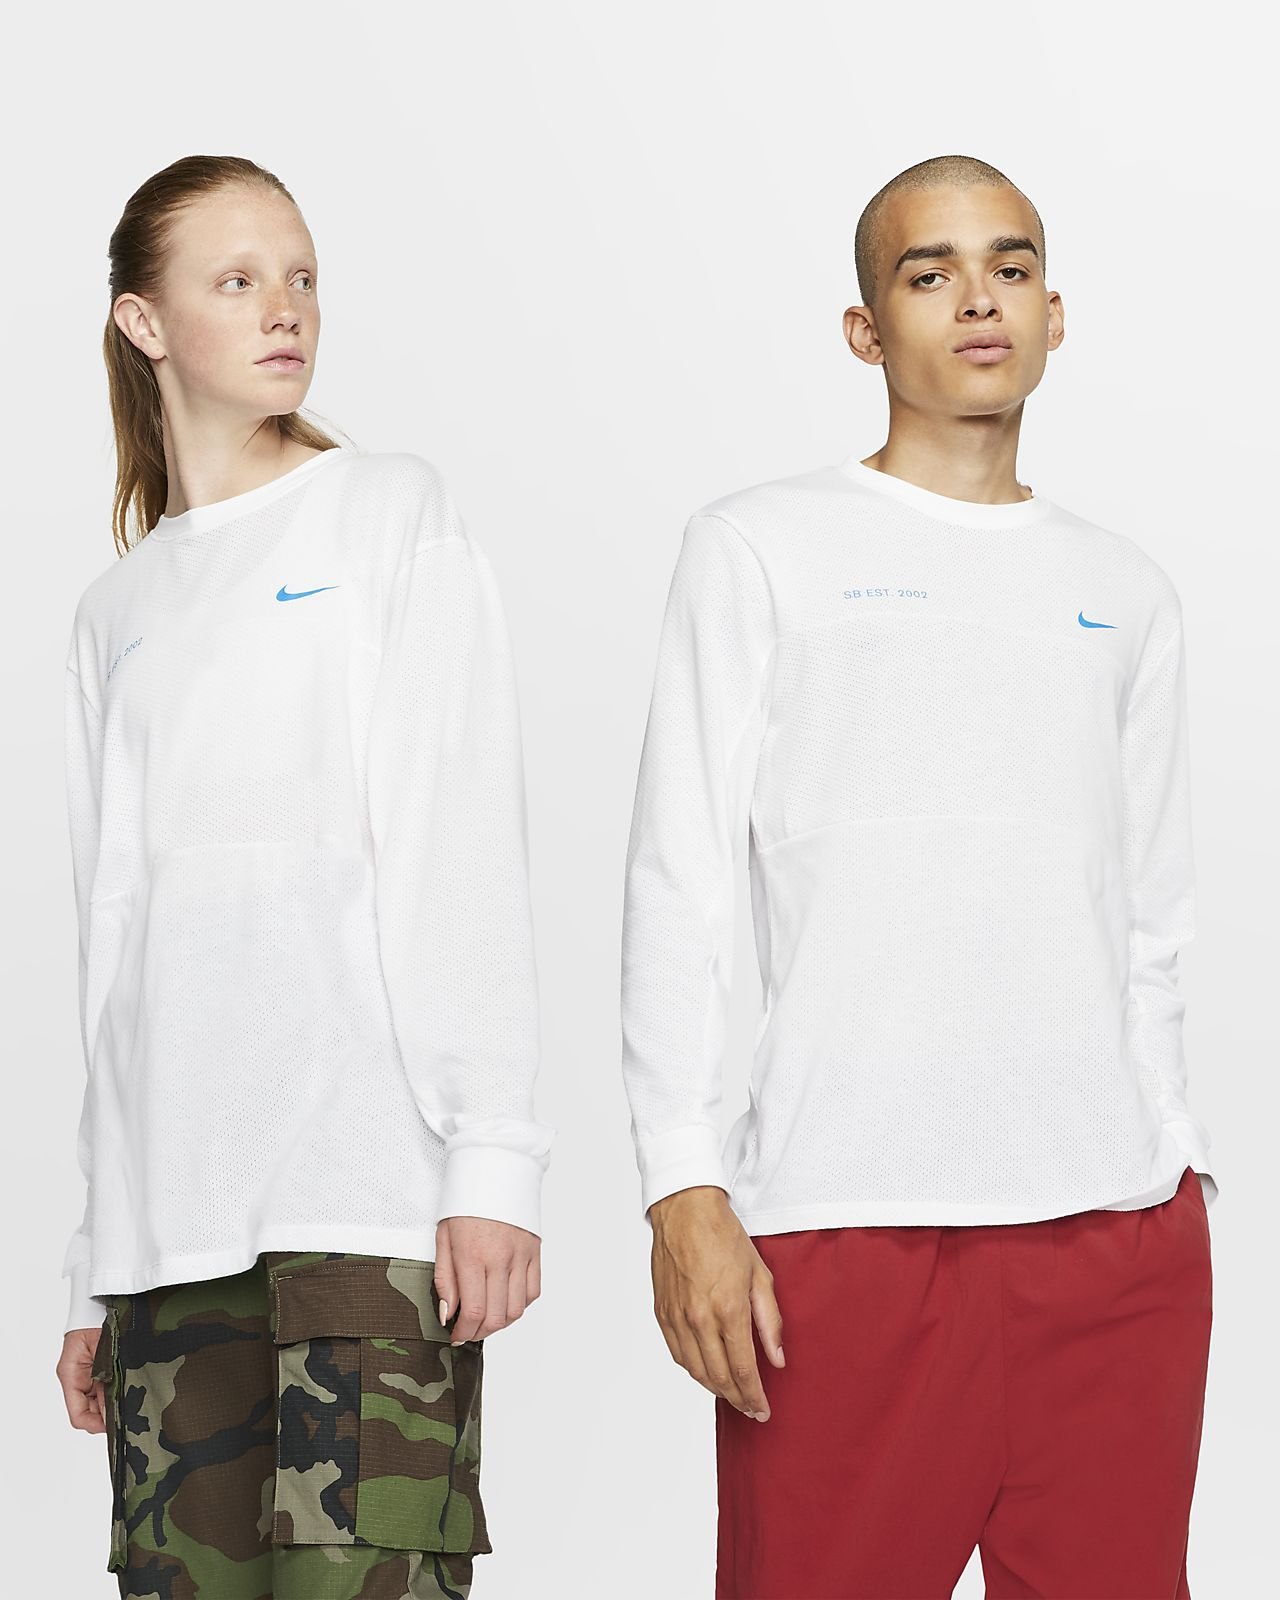 Nike SB Men's Mesh Long-Sleeve Skate Top